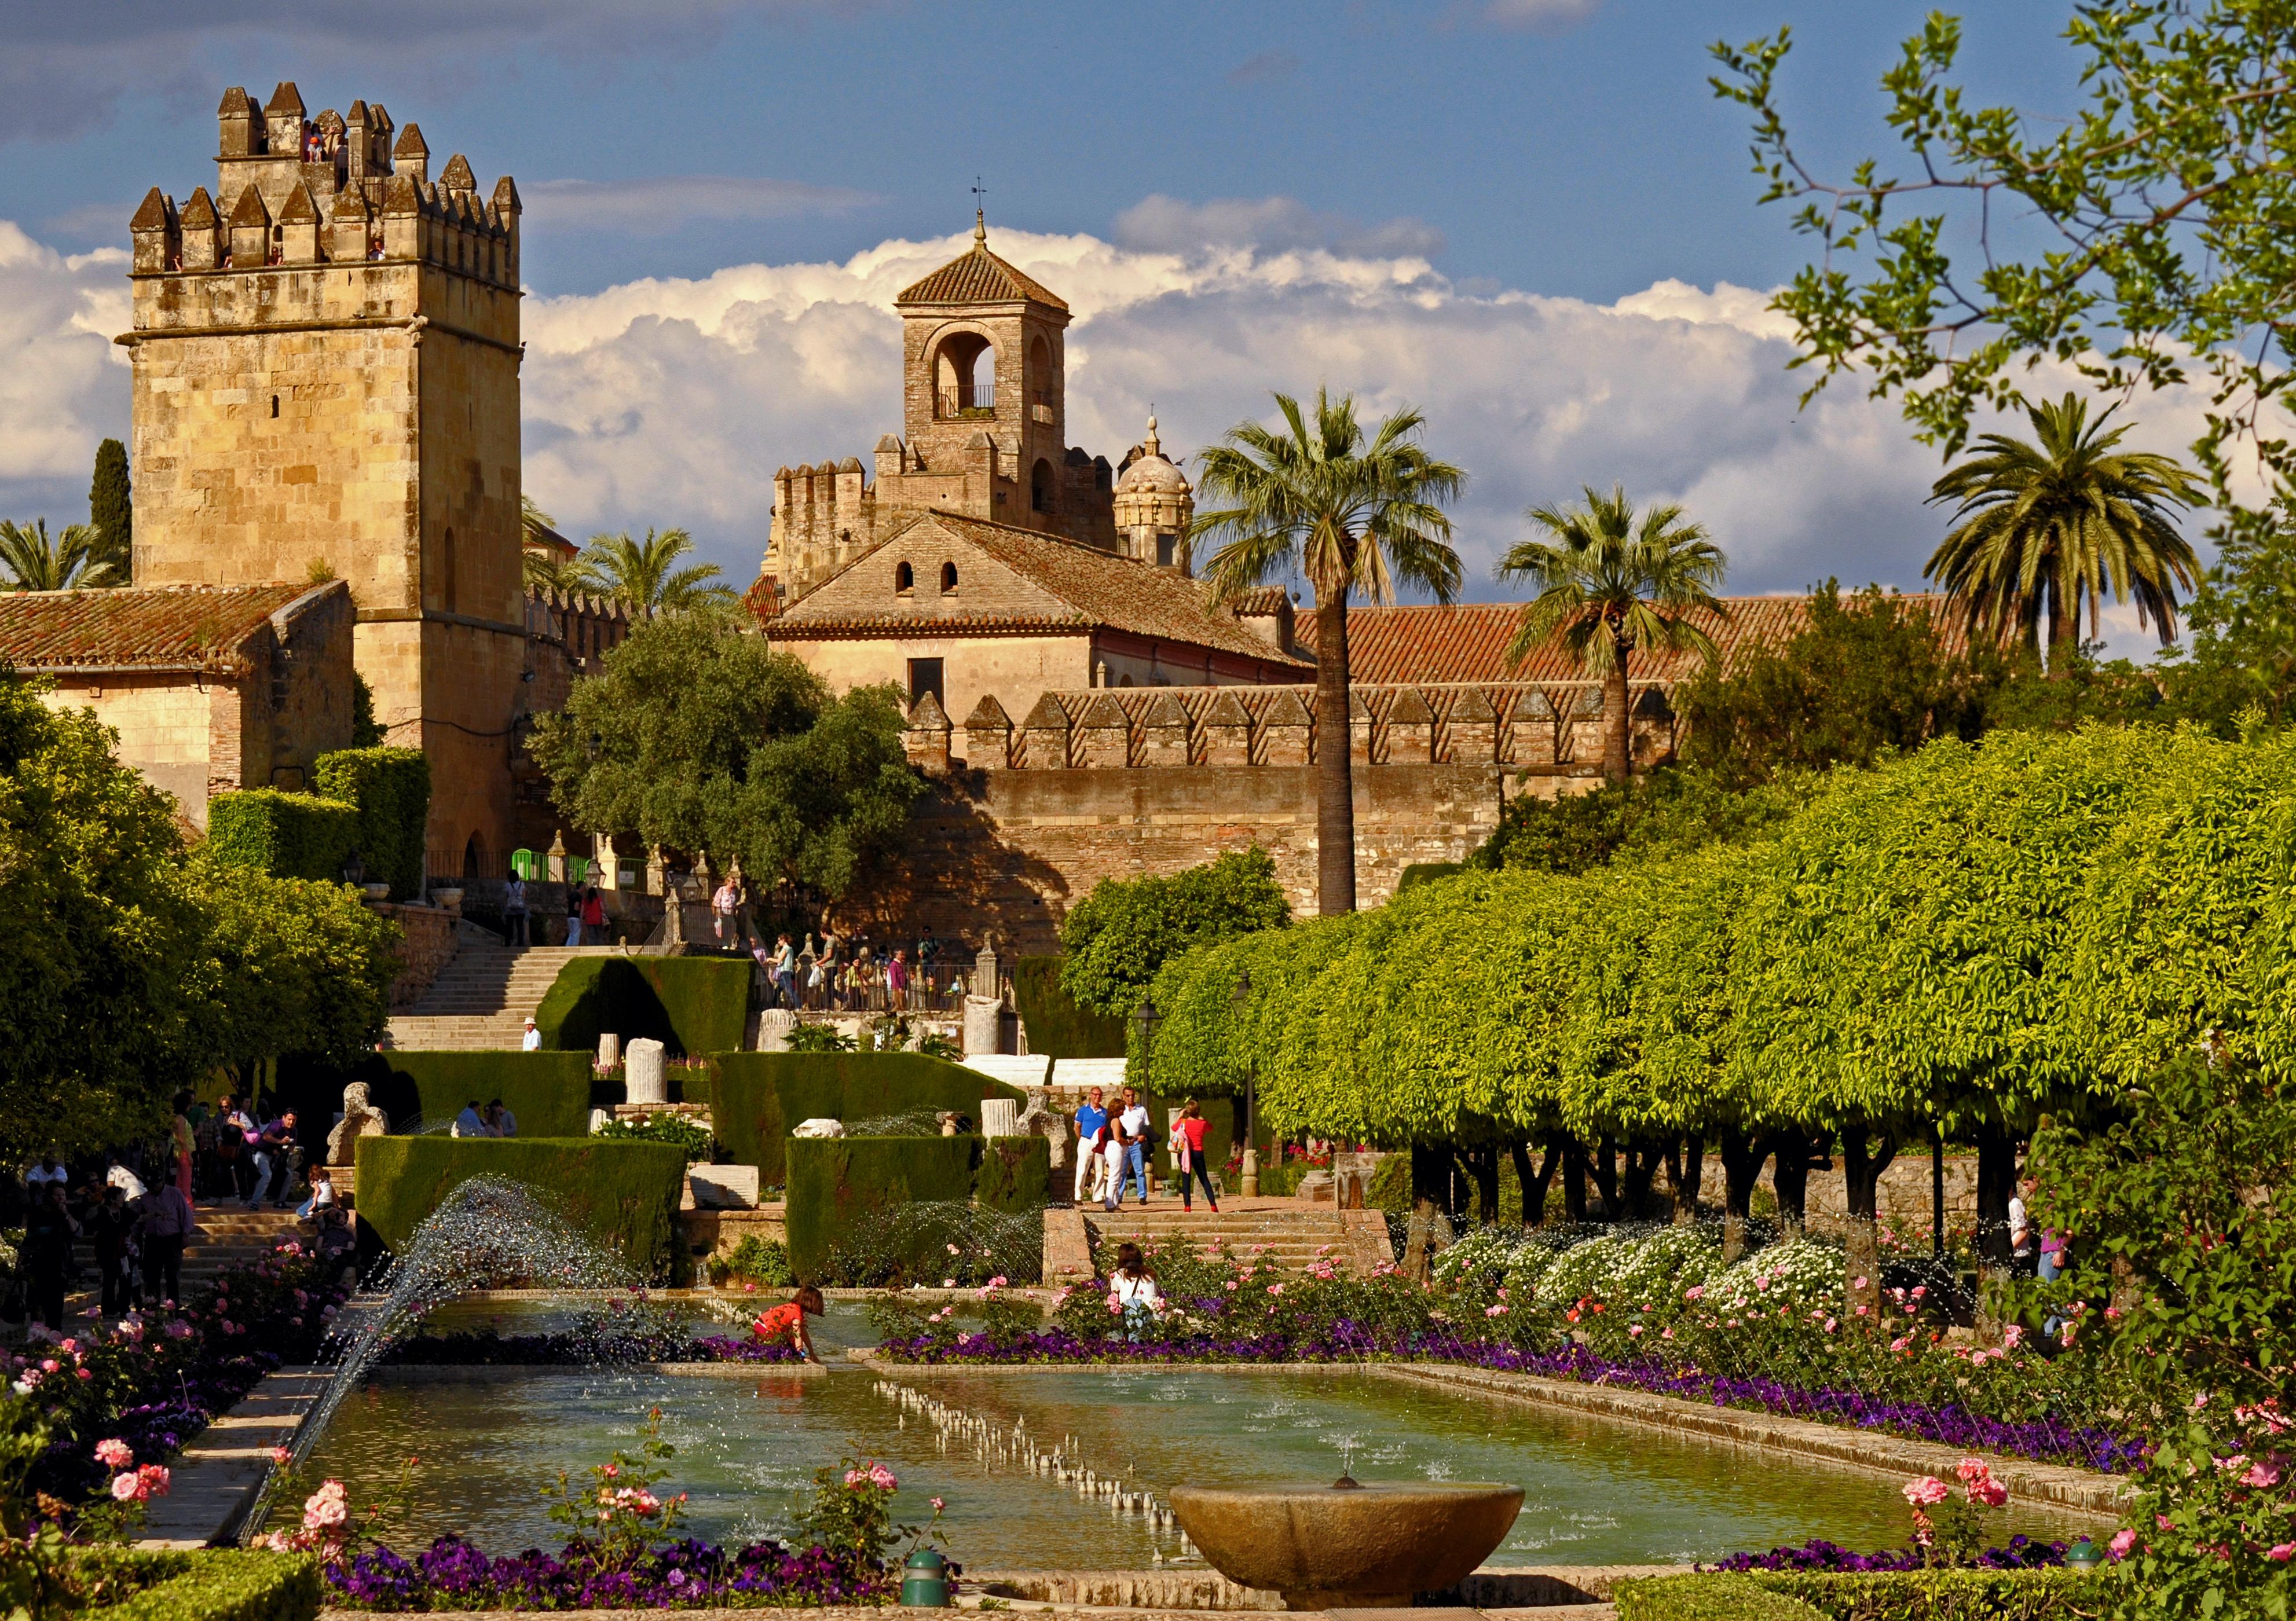 File:Gardens of the Alcázar de los Reyes Cristianos. Córdoba, Spain ...